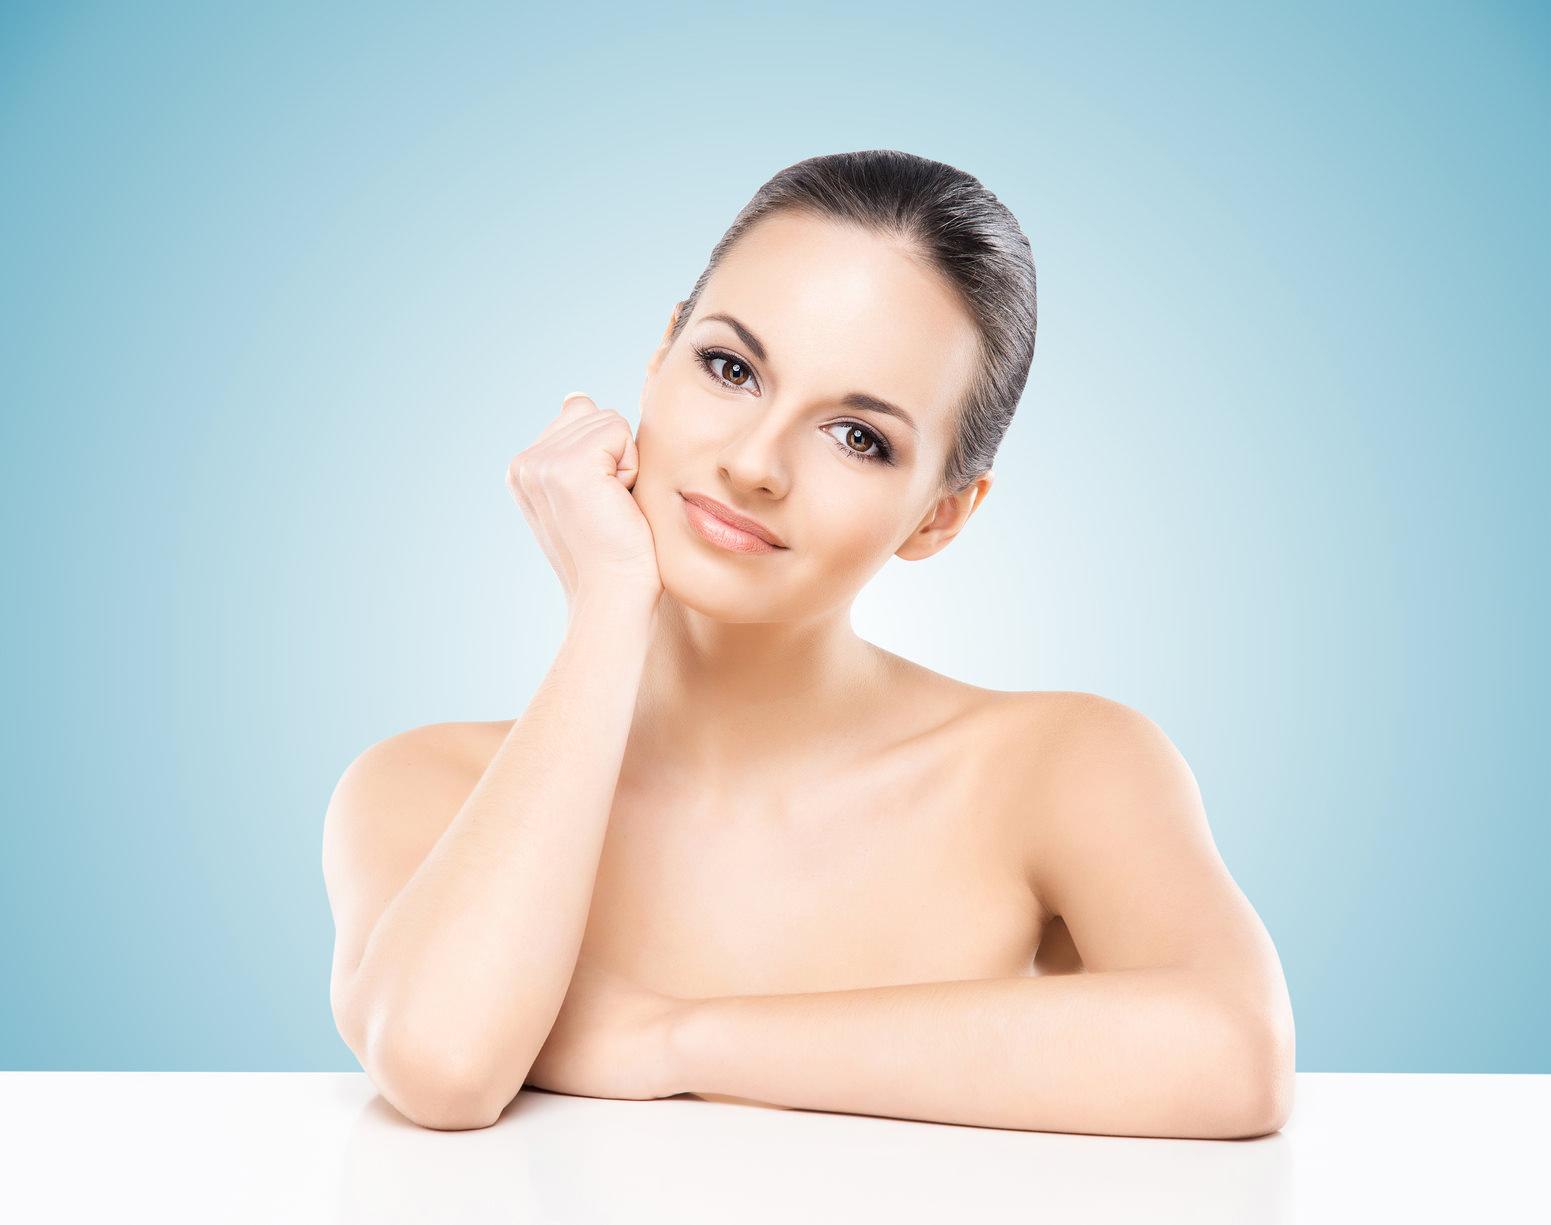 Clínica dermatológica madrid- mesoterapia facial